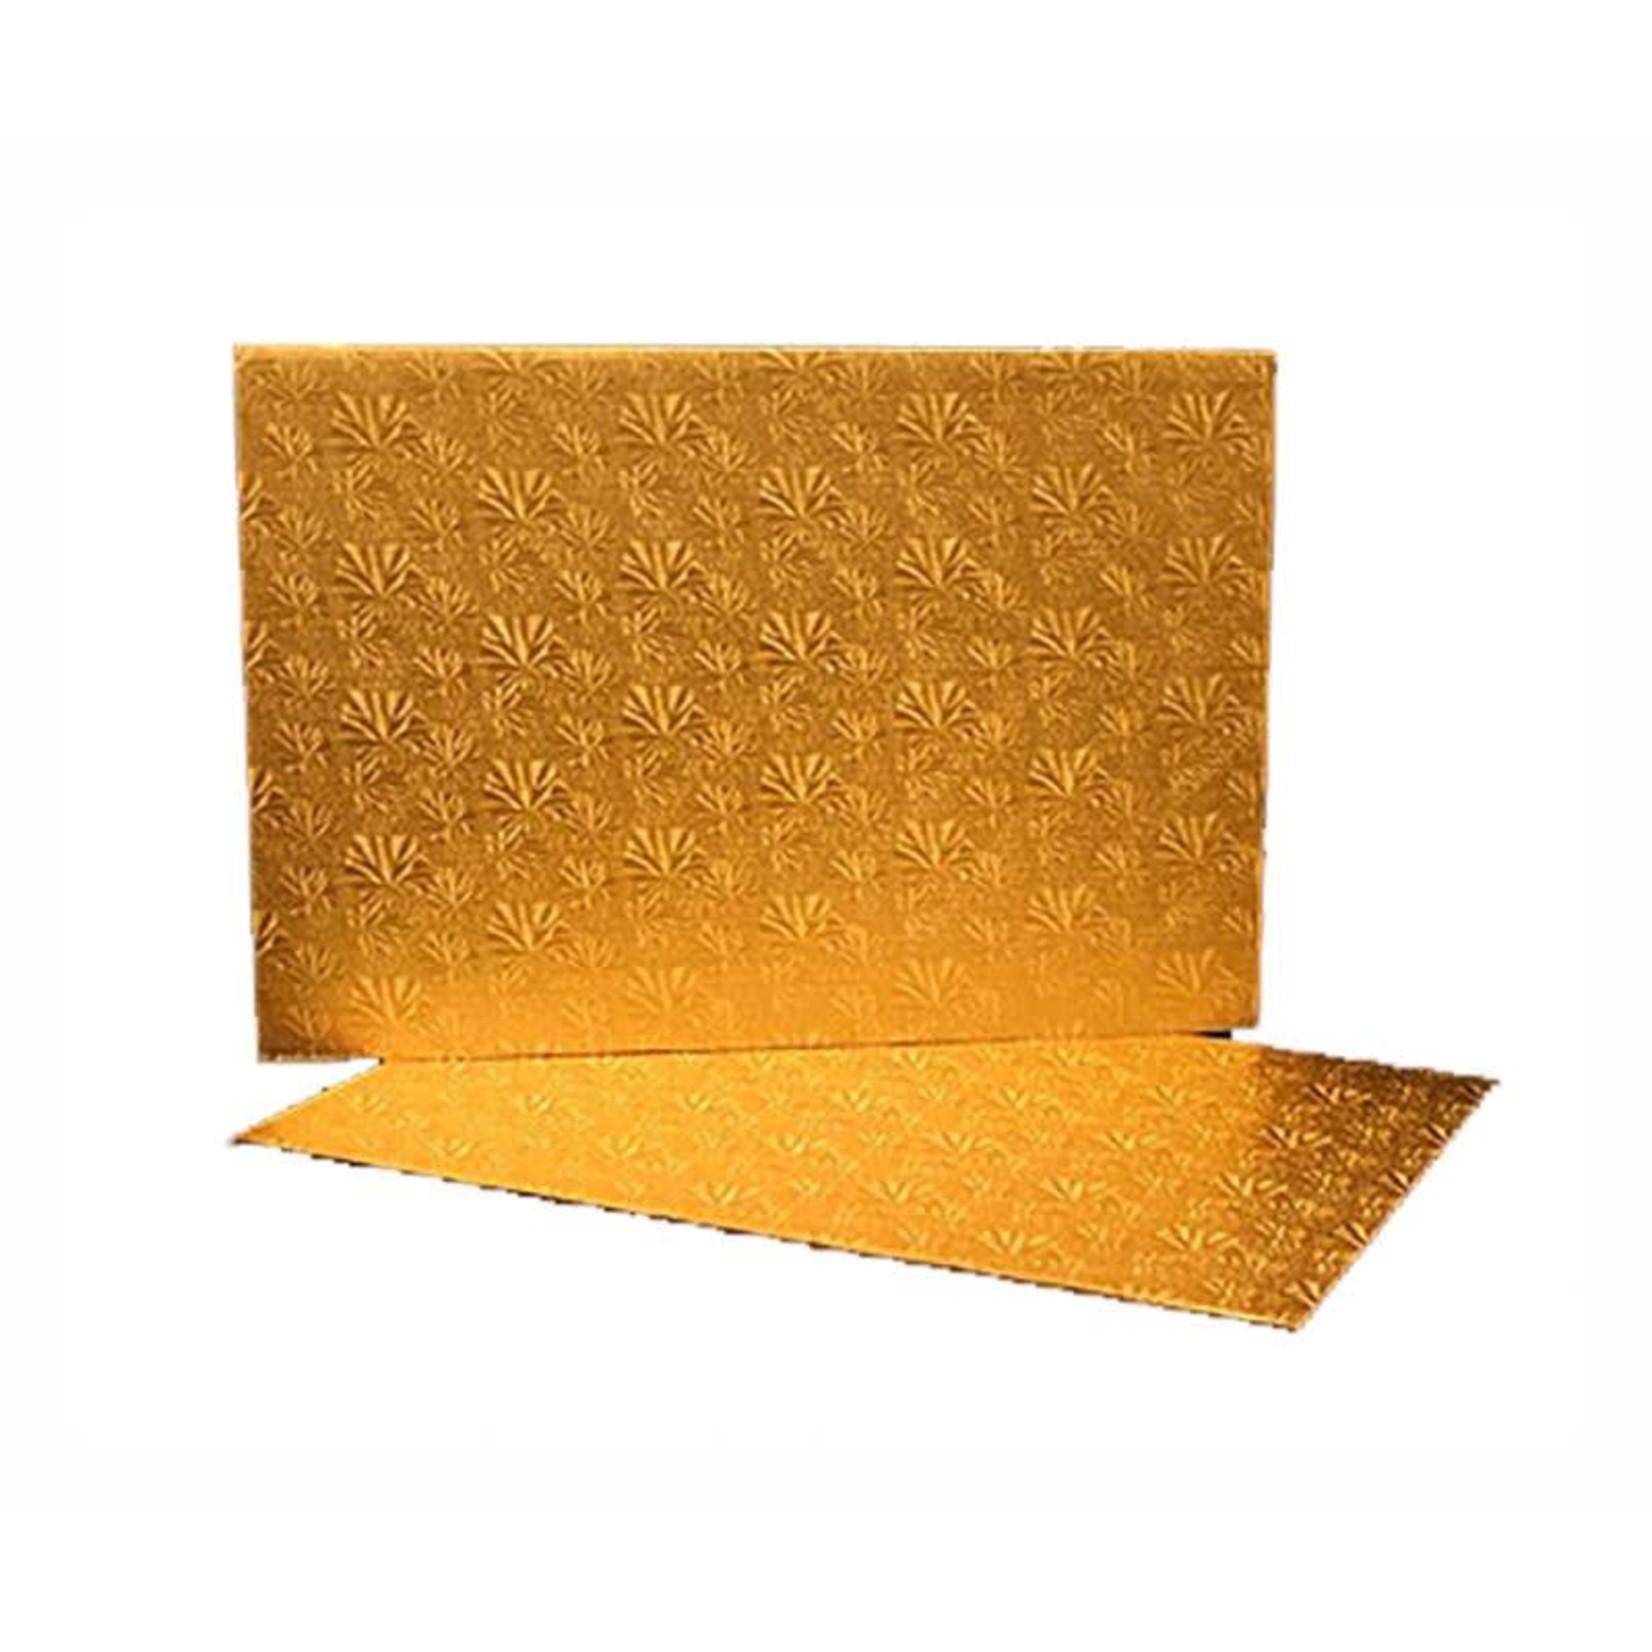 Pastry Depot Cake board - Gold foil log pad - 11.75x5.75''